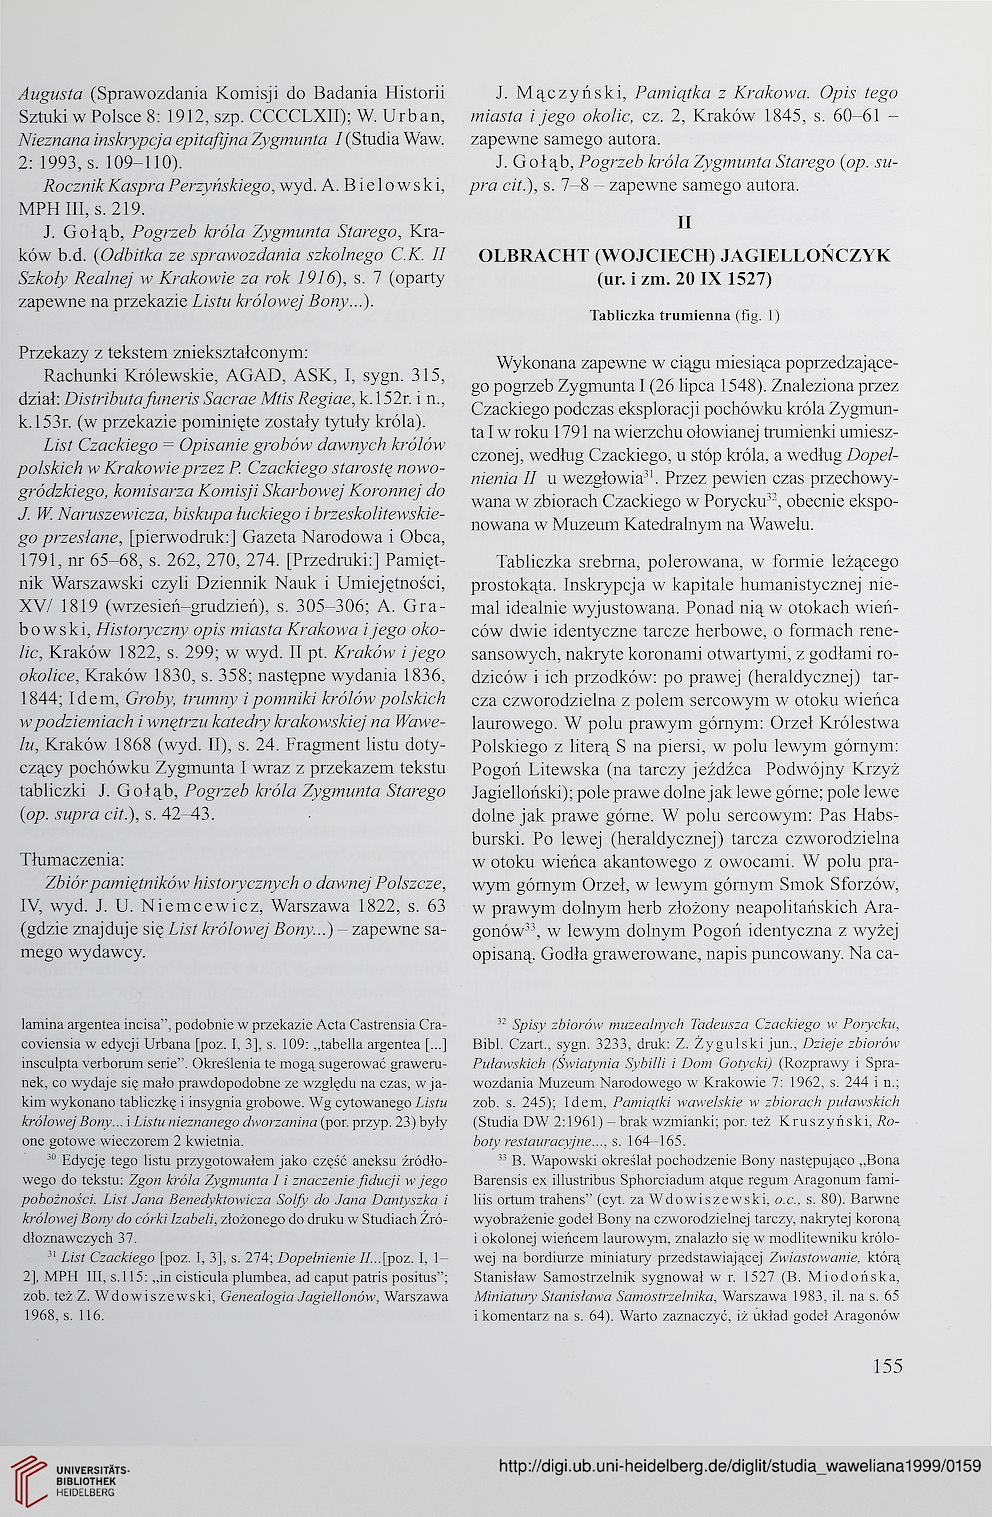 Studia Waweliana 81999